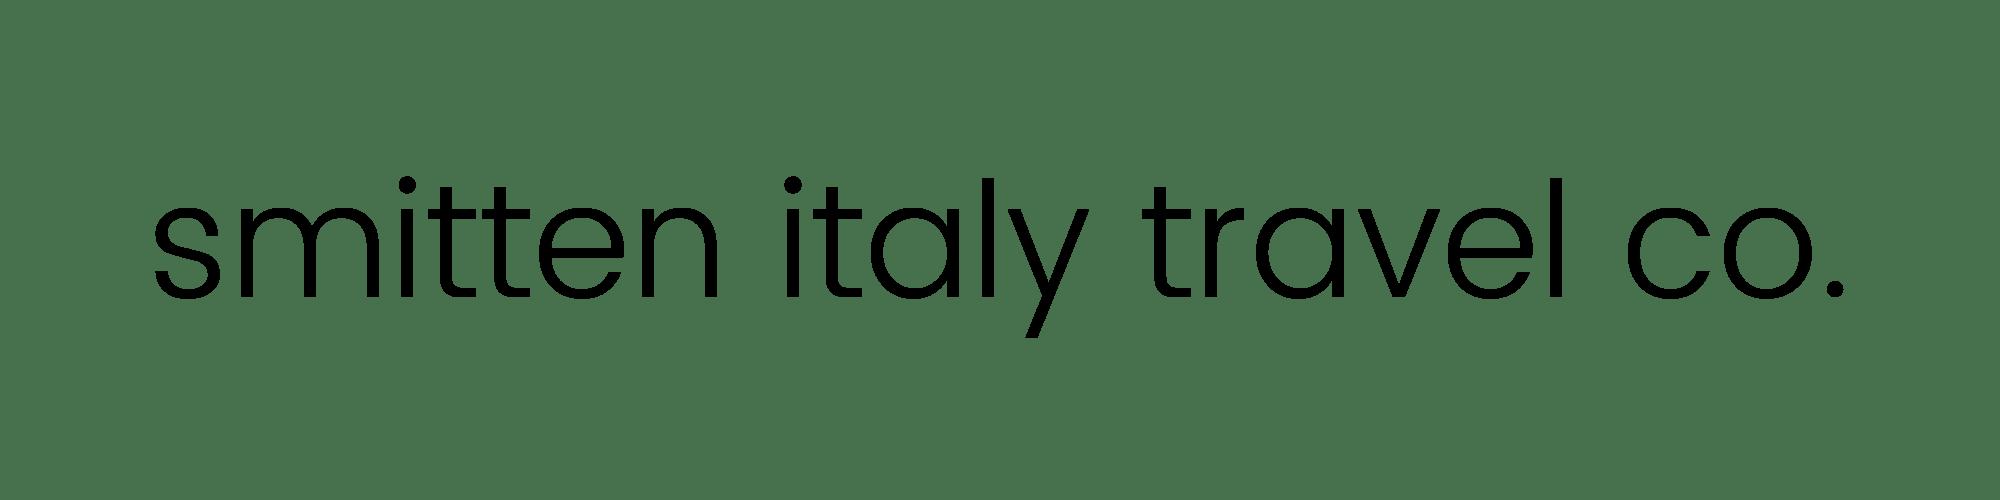 Smitten Italy Travel Co.